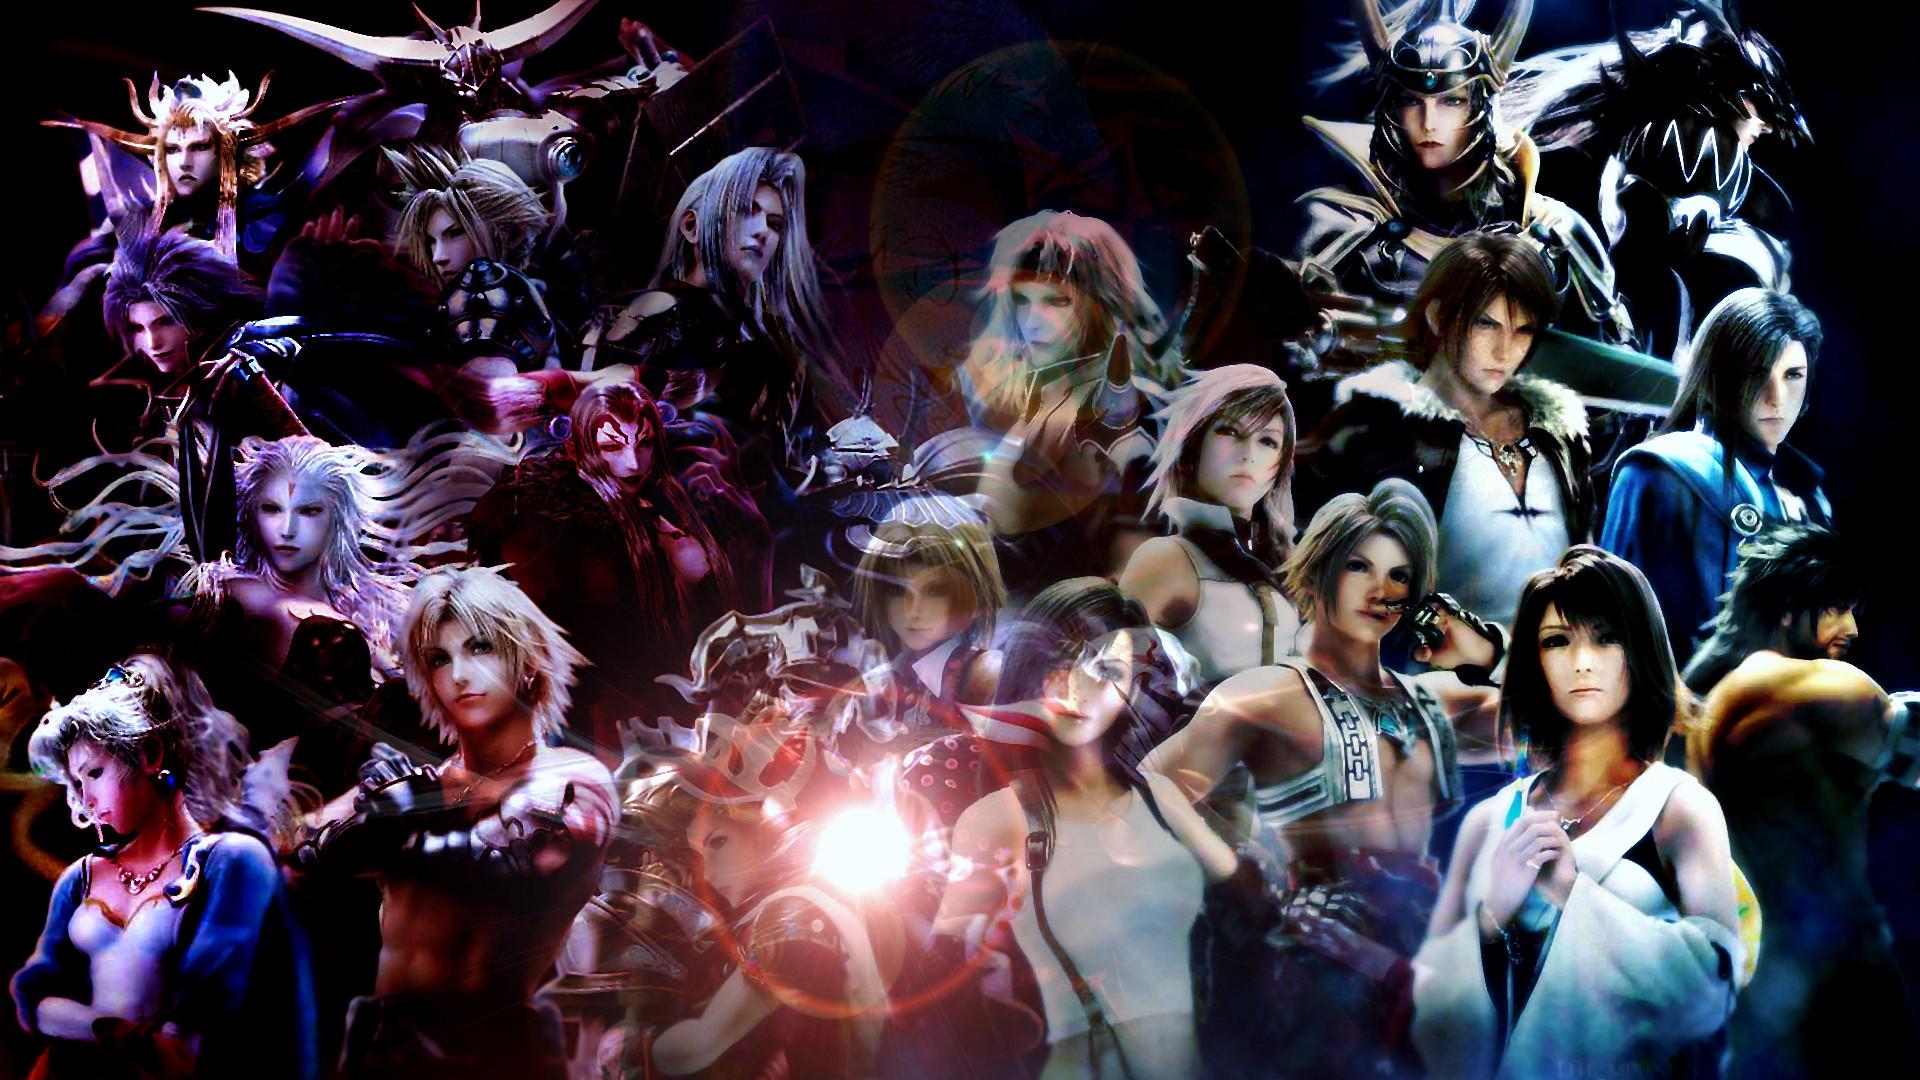 Tags: Anime, Final Fantasy VII, Final Fantasy VIII, Final Fantasy XIII,